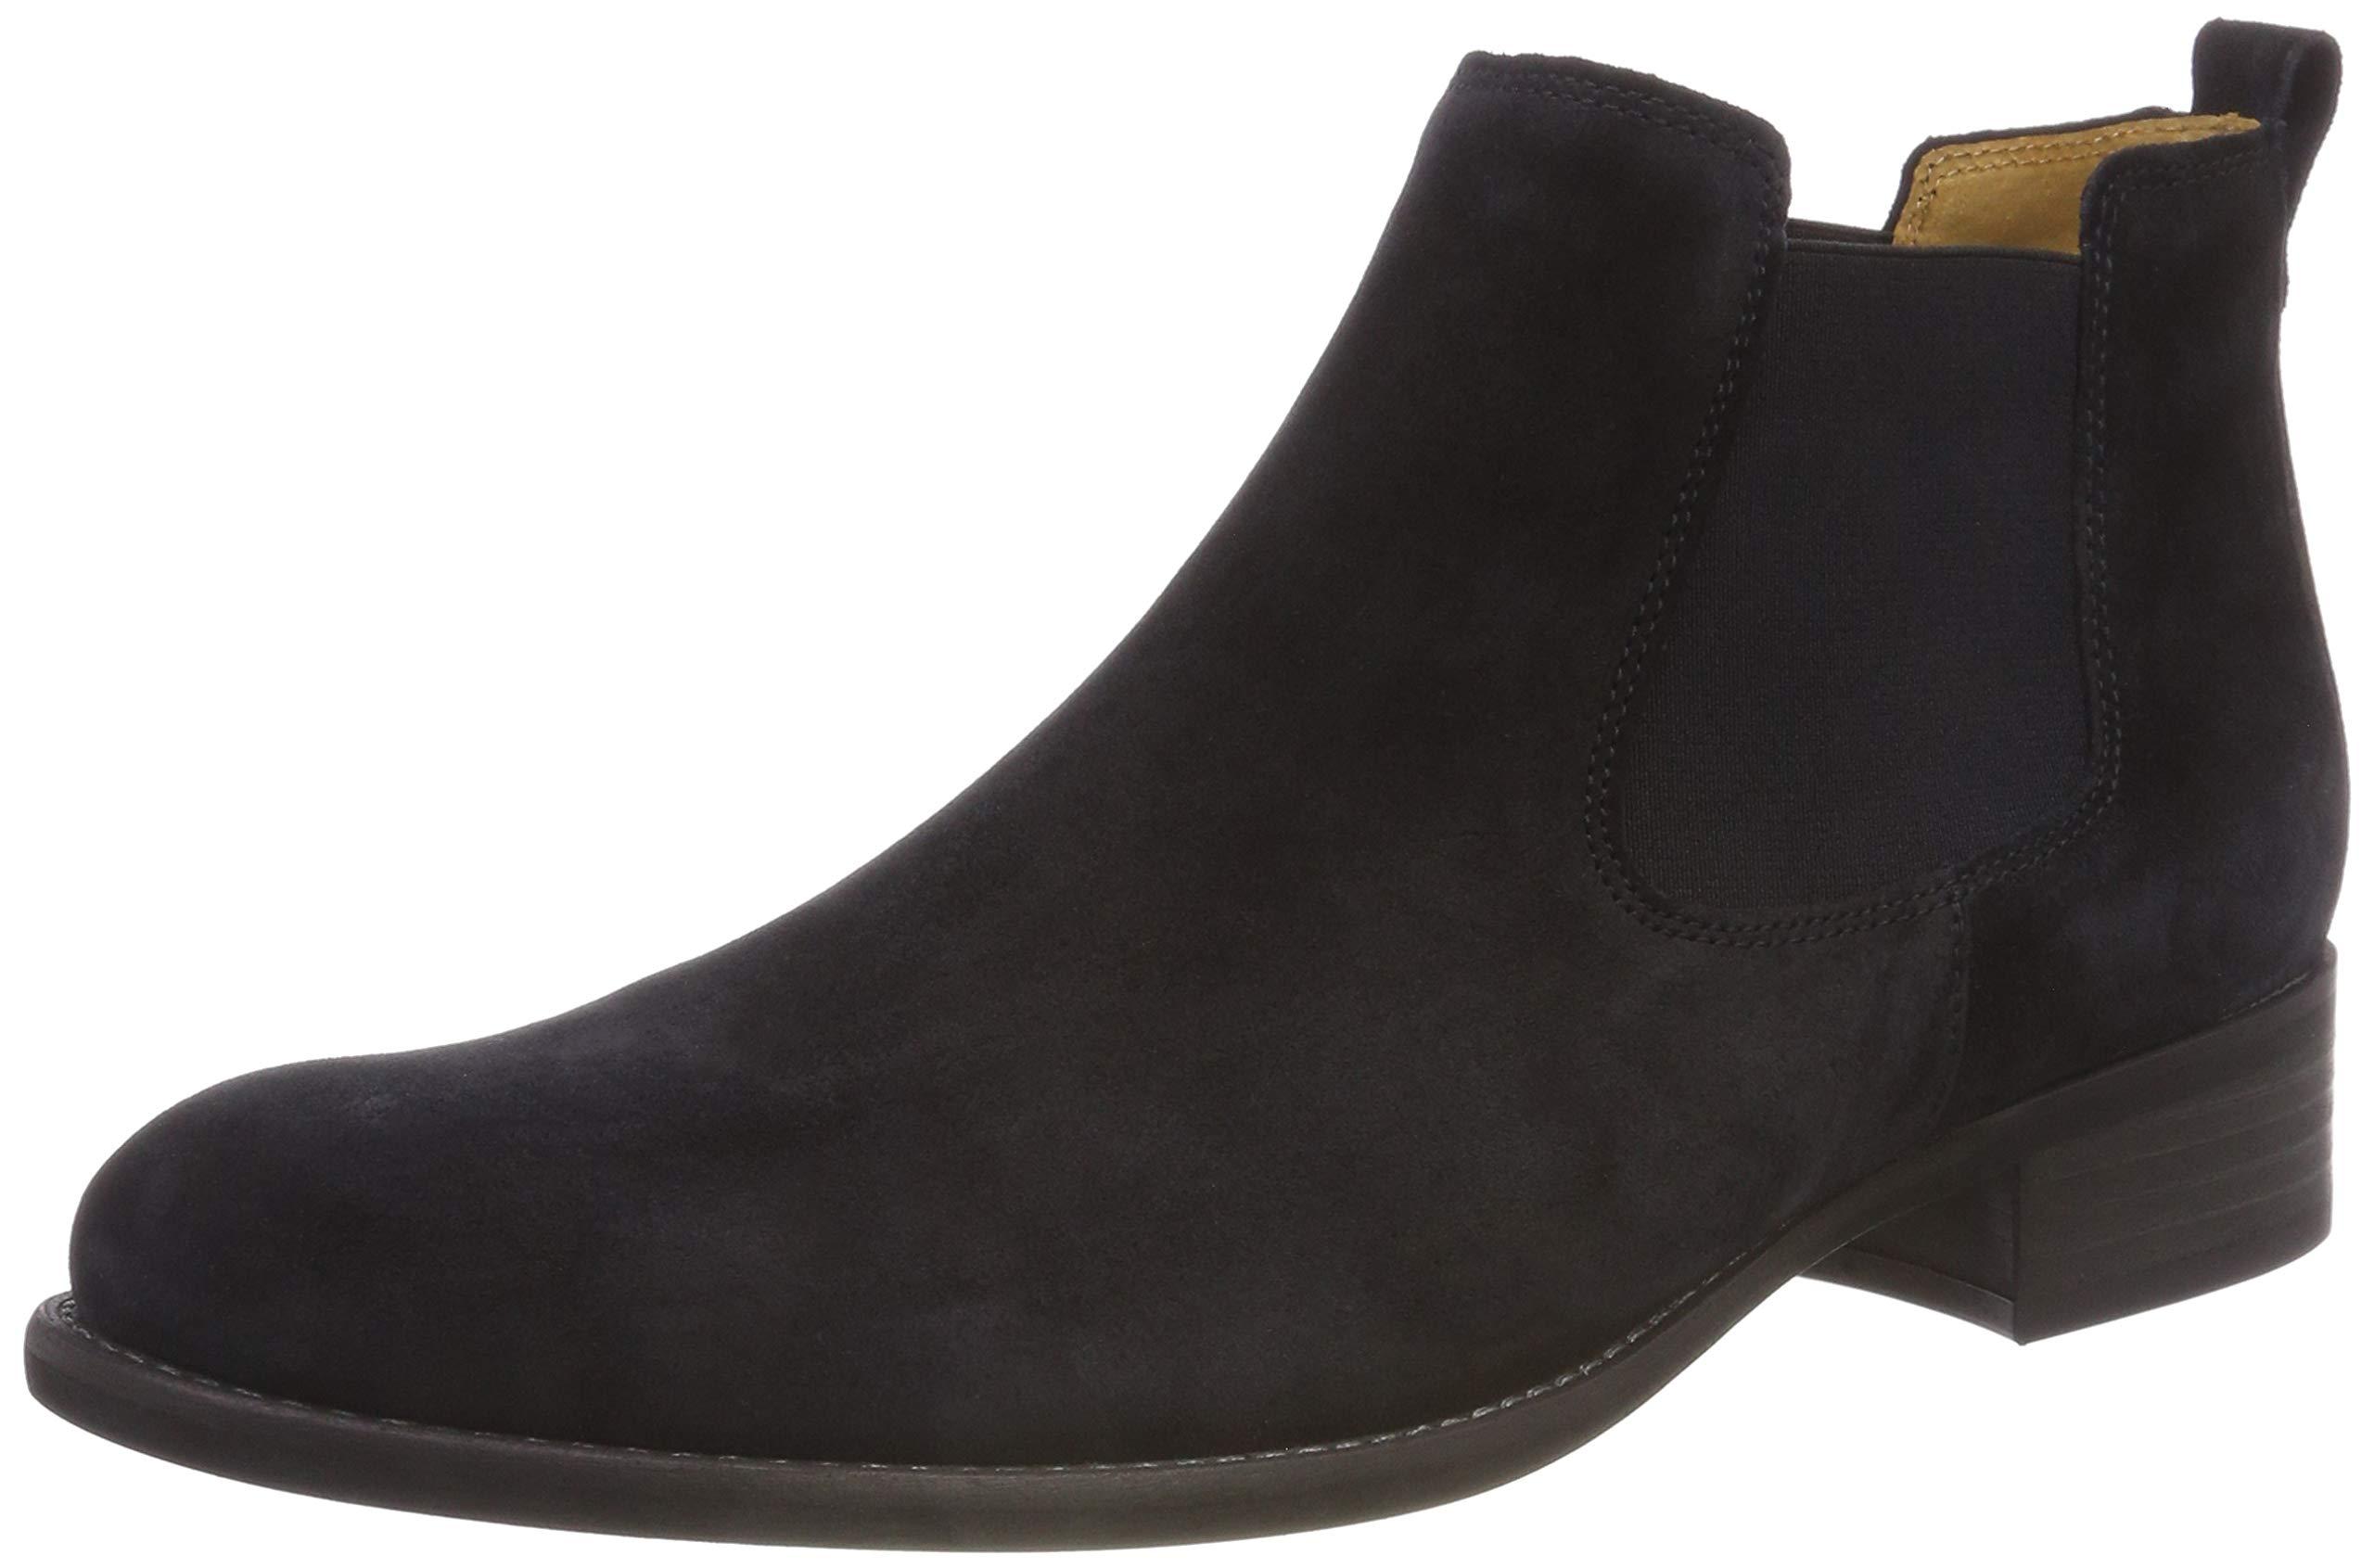 Eu Shoes 5 Gabor FemmeBleupazifik FashionBotines 1640 PiukXZ